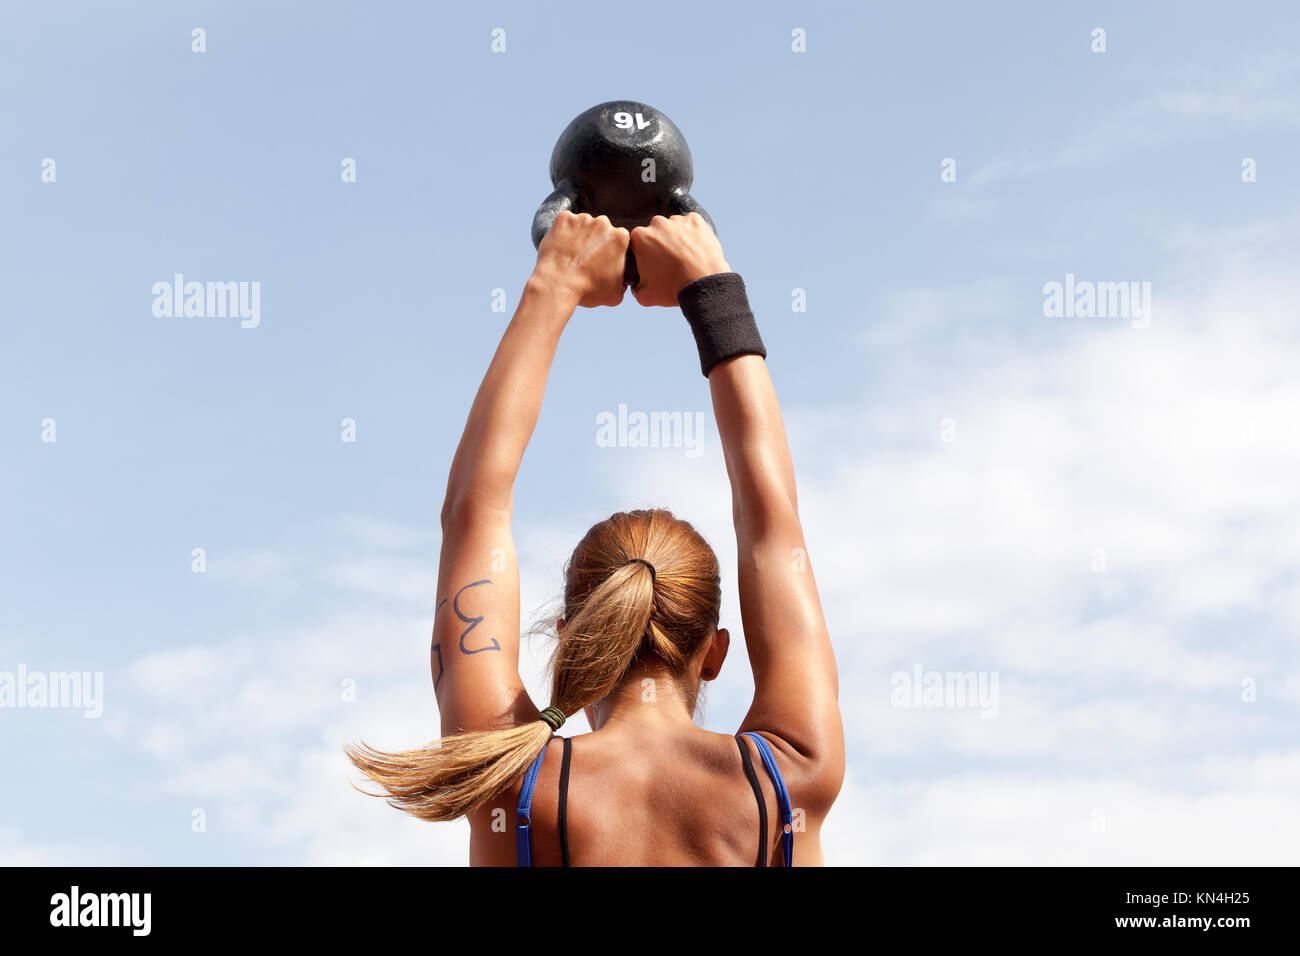 Person Swinging Kettle Bell Imágenes De Stock & Person Swinging ...